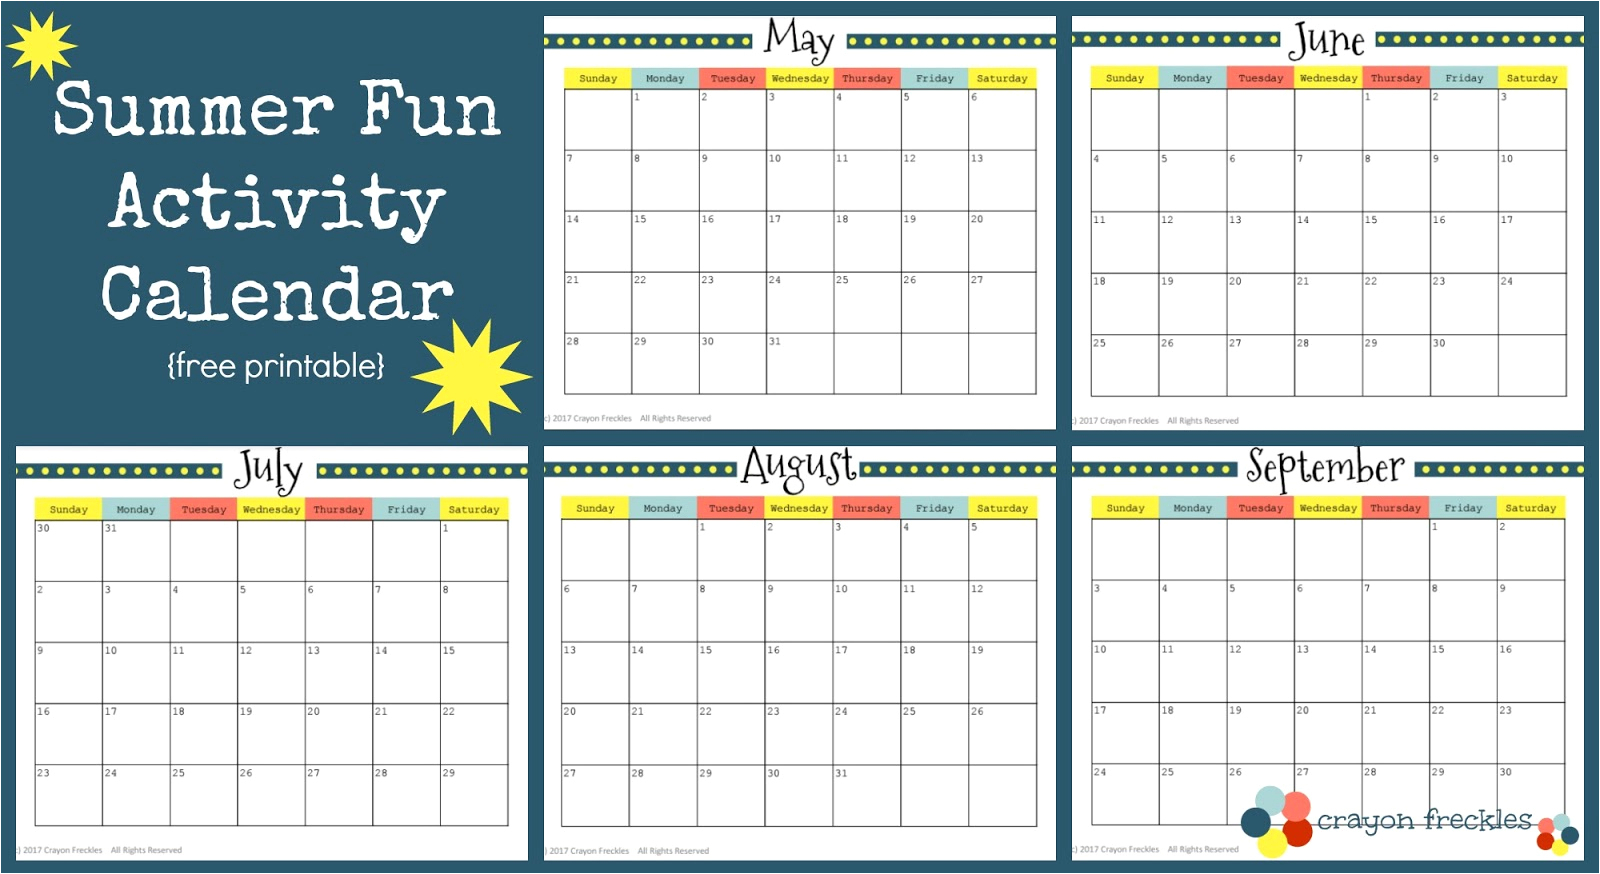 Lovely 35 Sample Summer Calendar Template | Blank Calendar Templates within Summer Activity Calendar Template